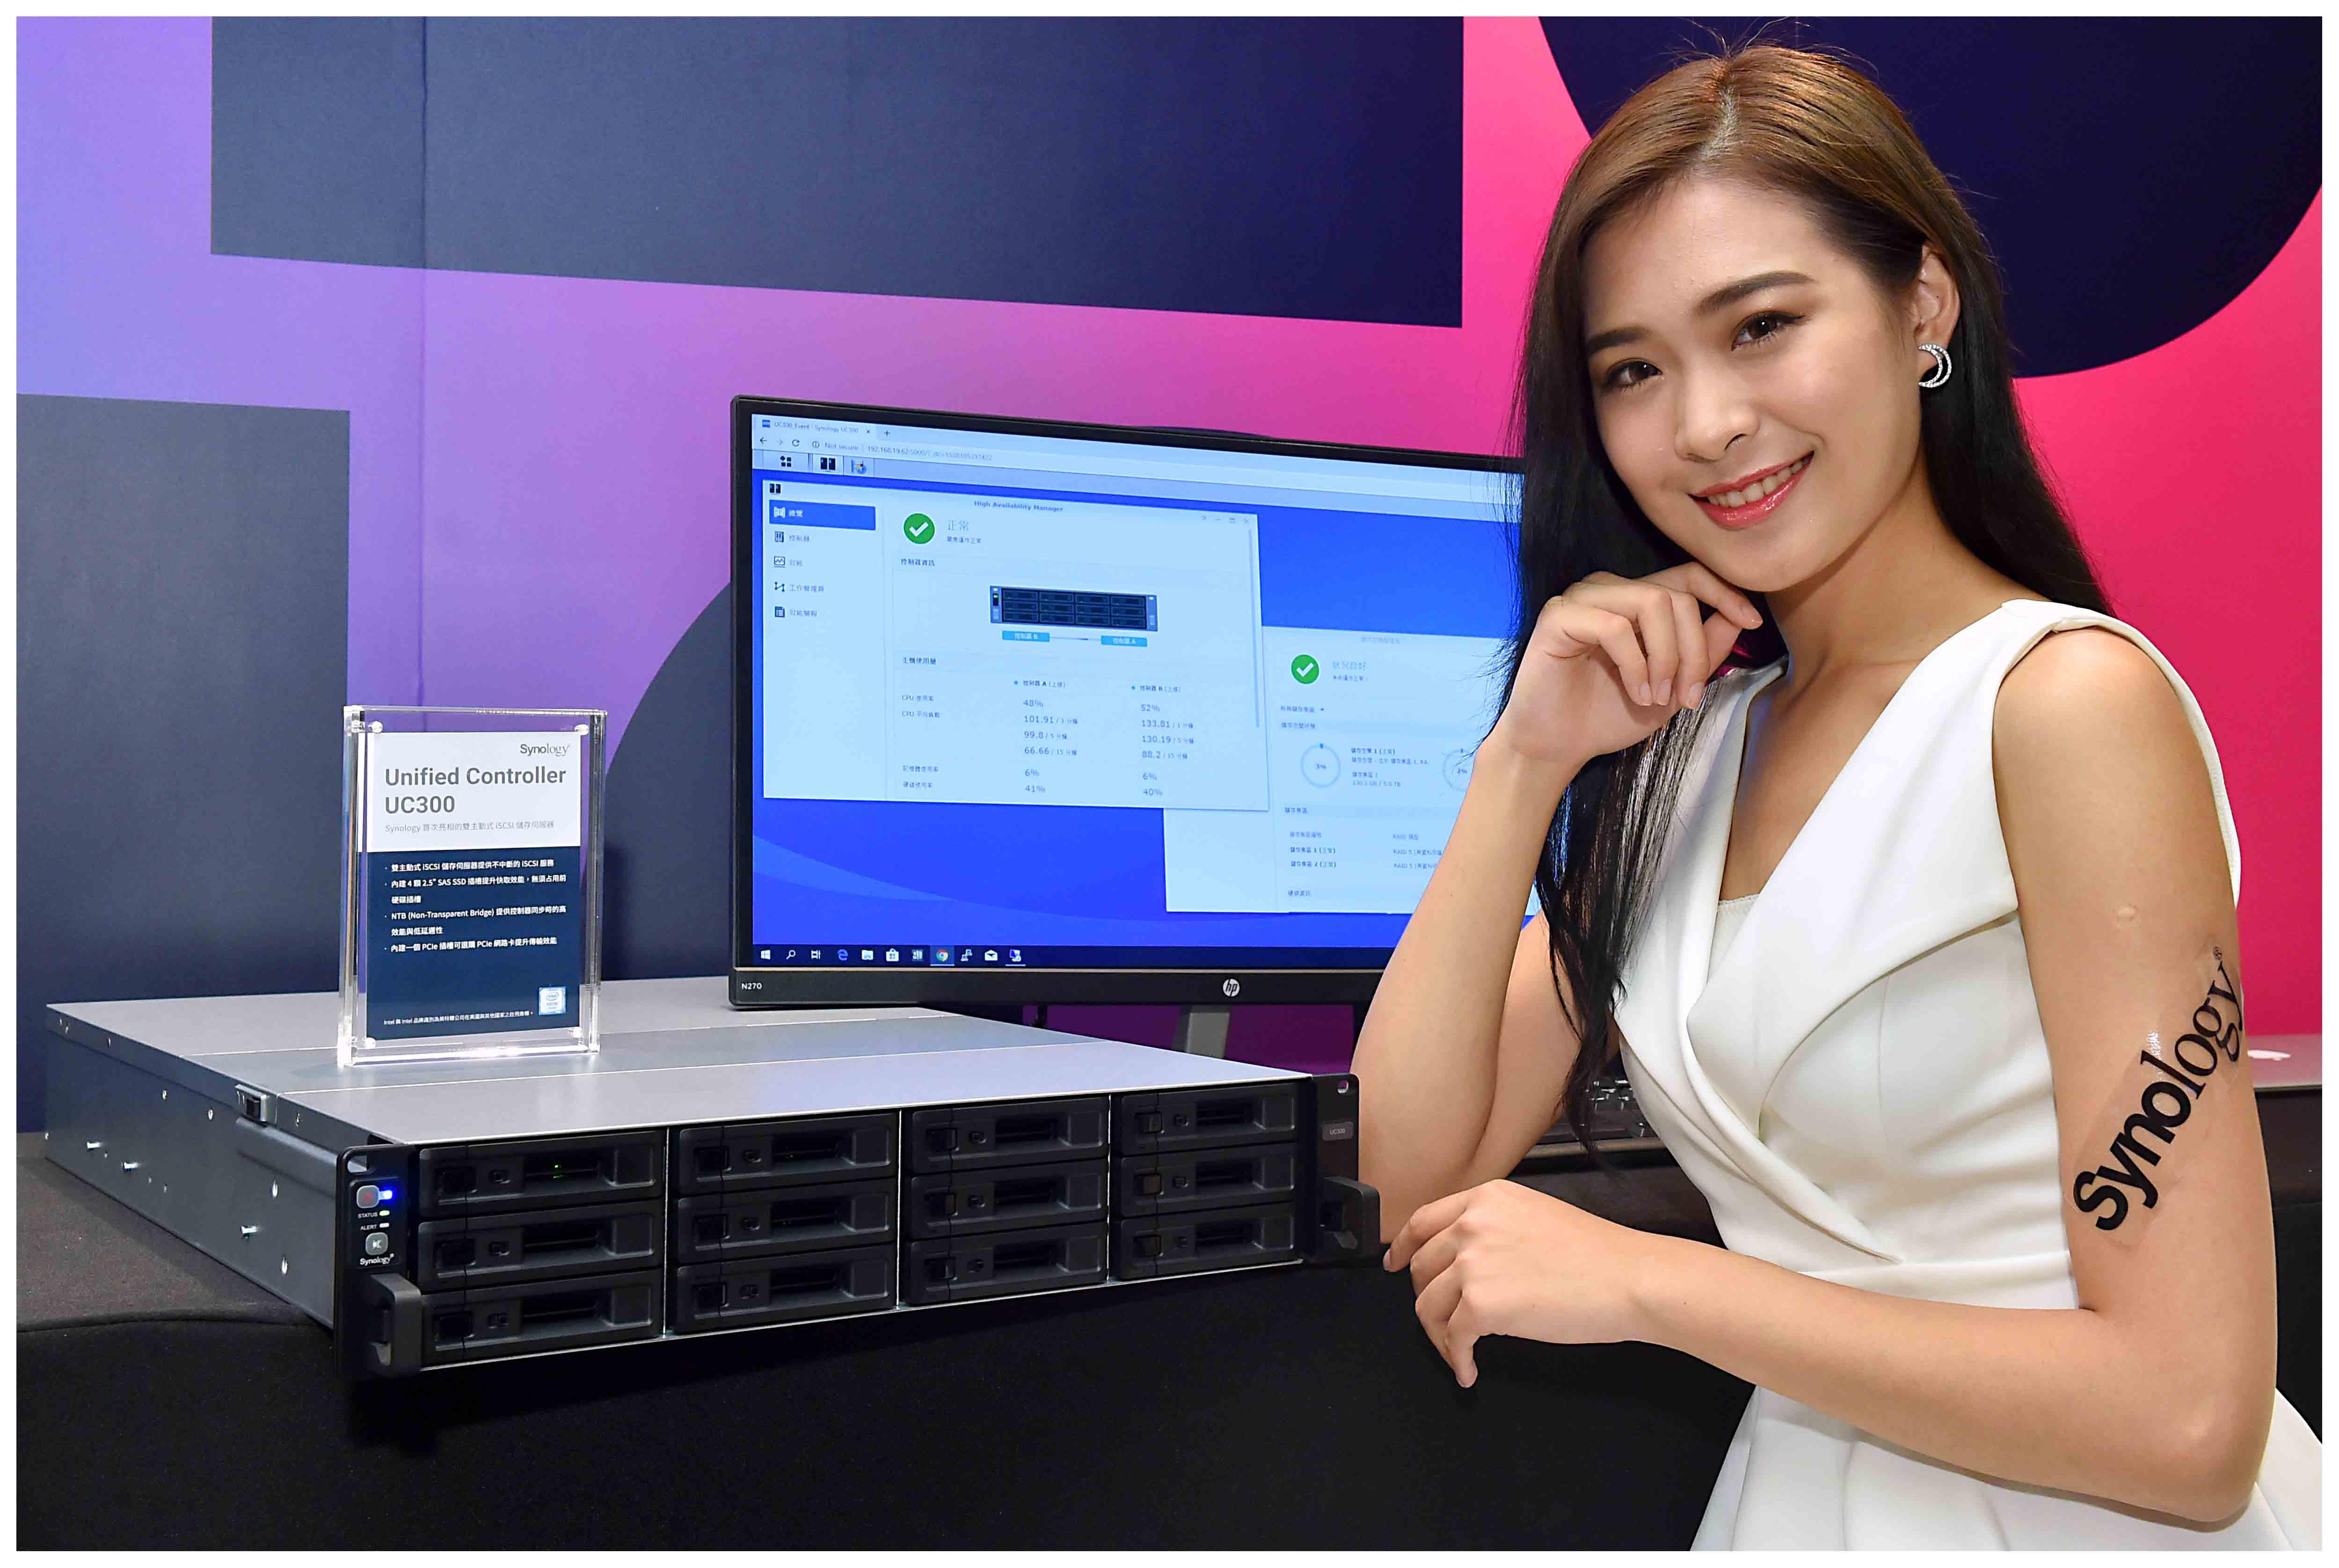 Synology 2019 發表會登場,揭露儲存、備份、網通市場新佈局